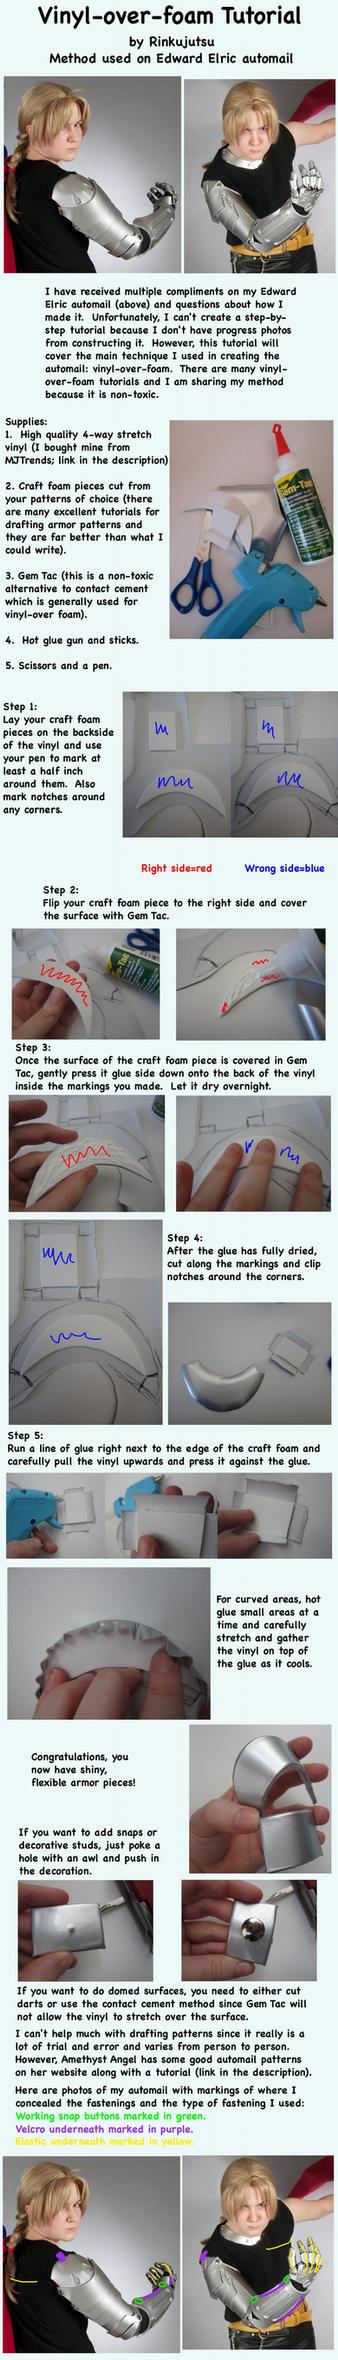 Vinyl over foam tutorial - Edward Elric automail by Rinkujutsu